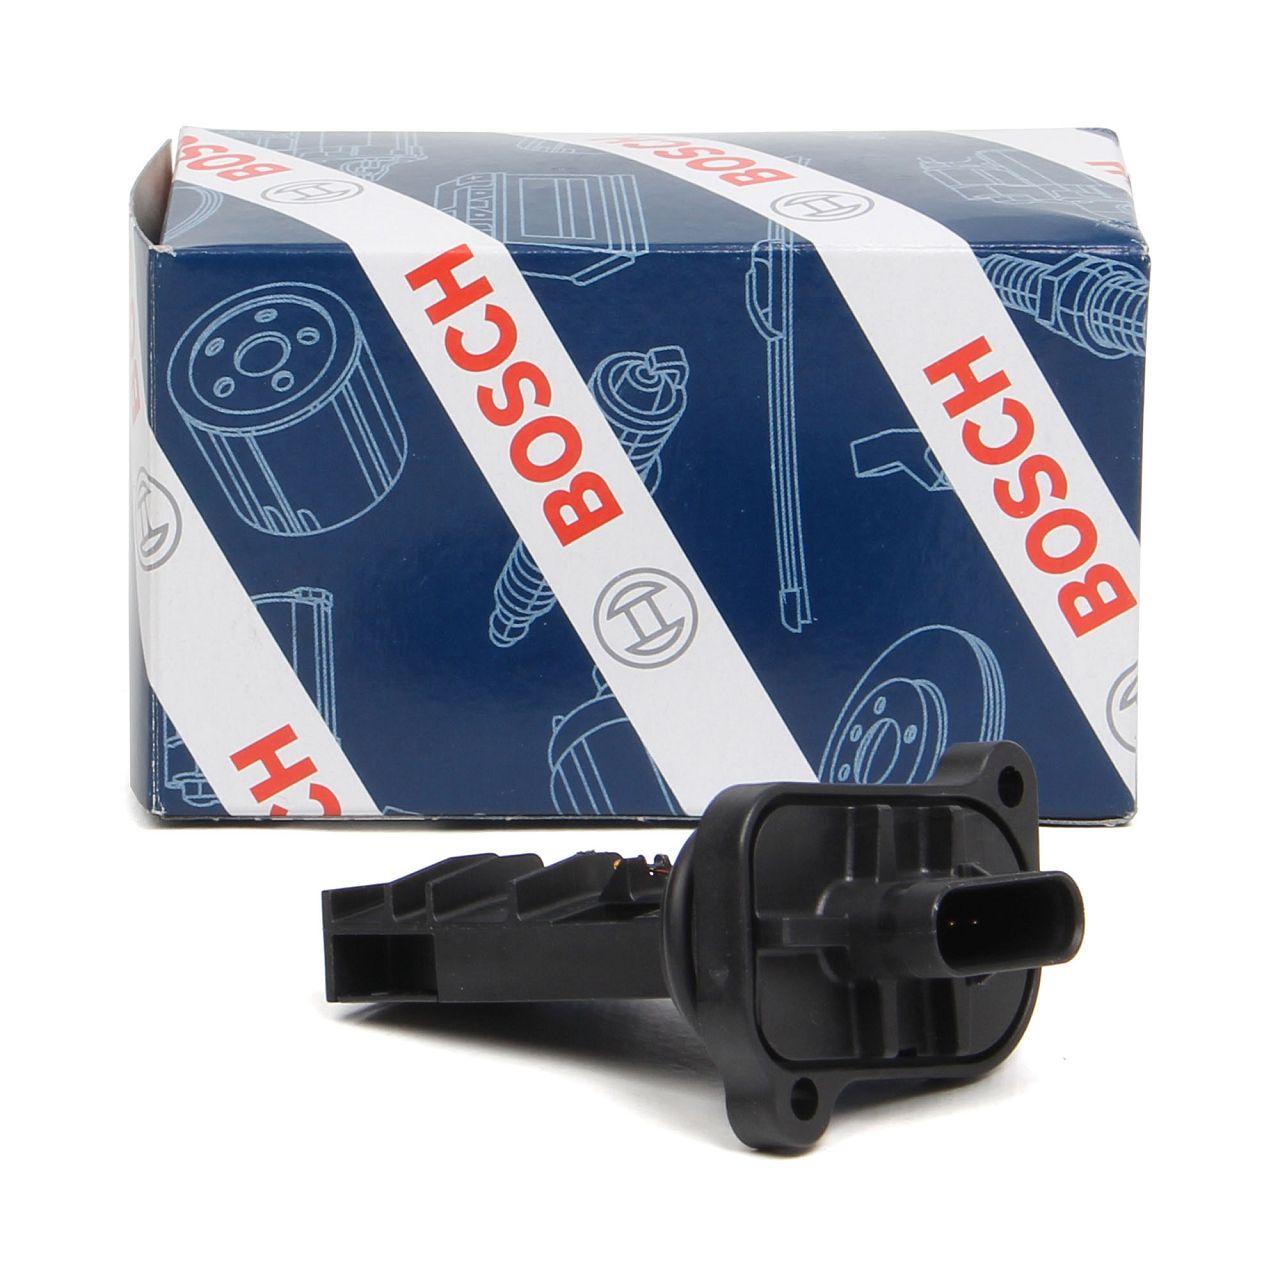 BOSCH Sensor Luftmassenmesser für BMW F20-F22 F30-F34 F10-F11 F25 F15 Diesel